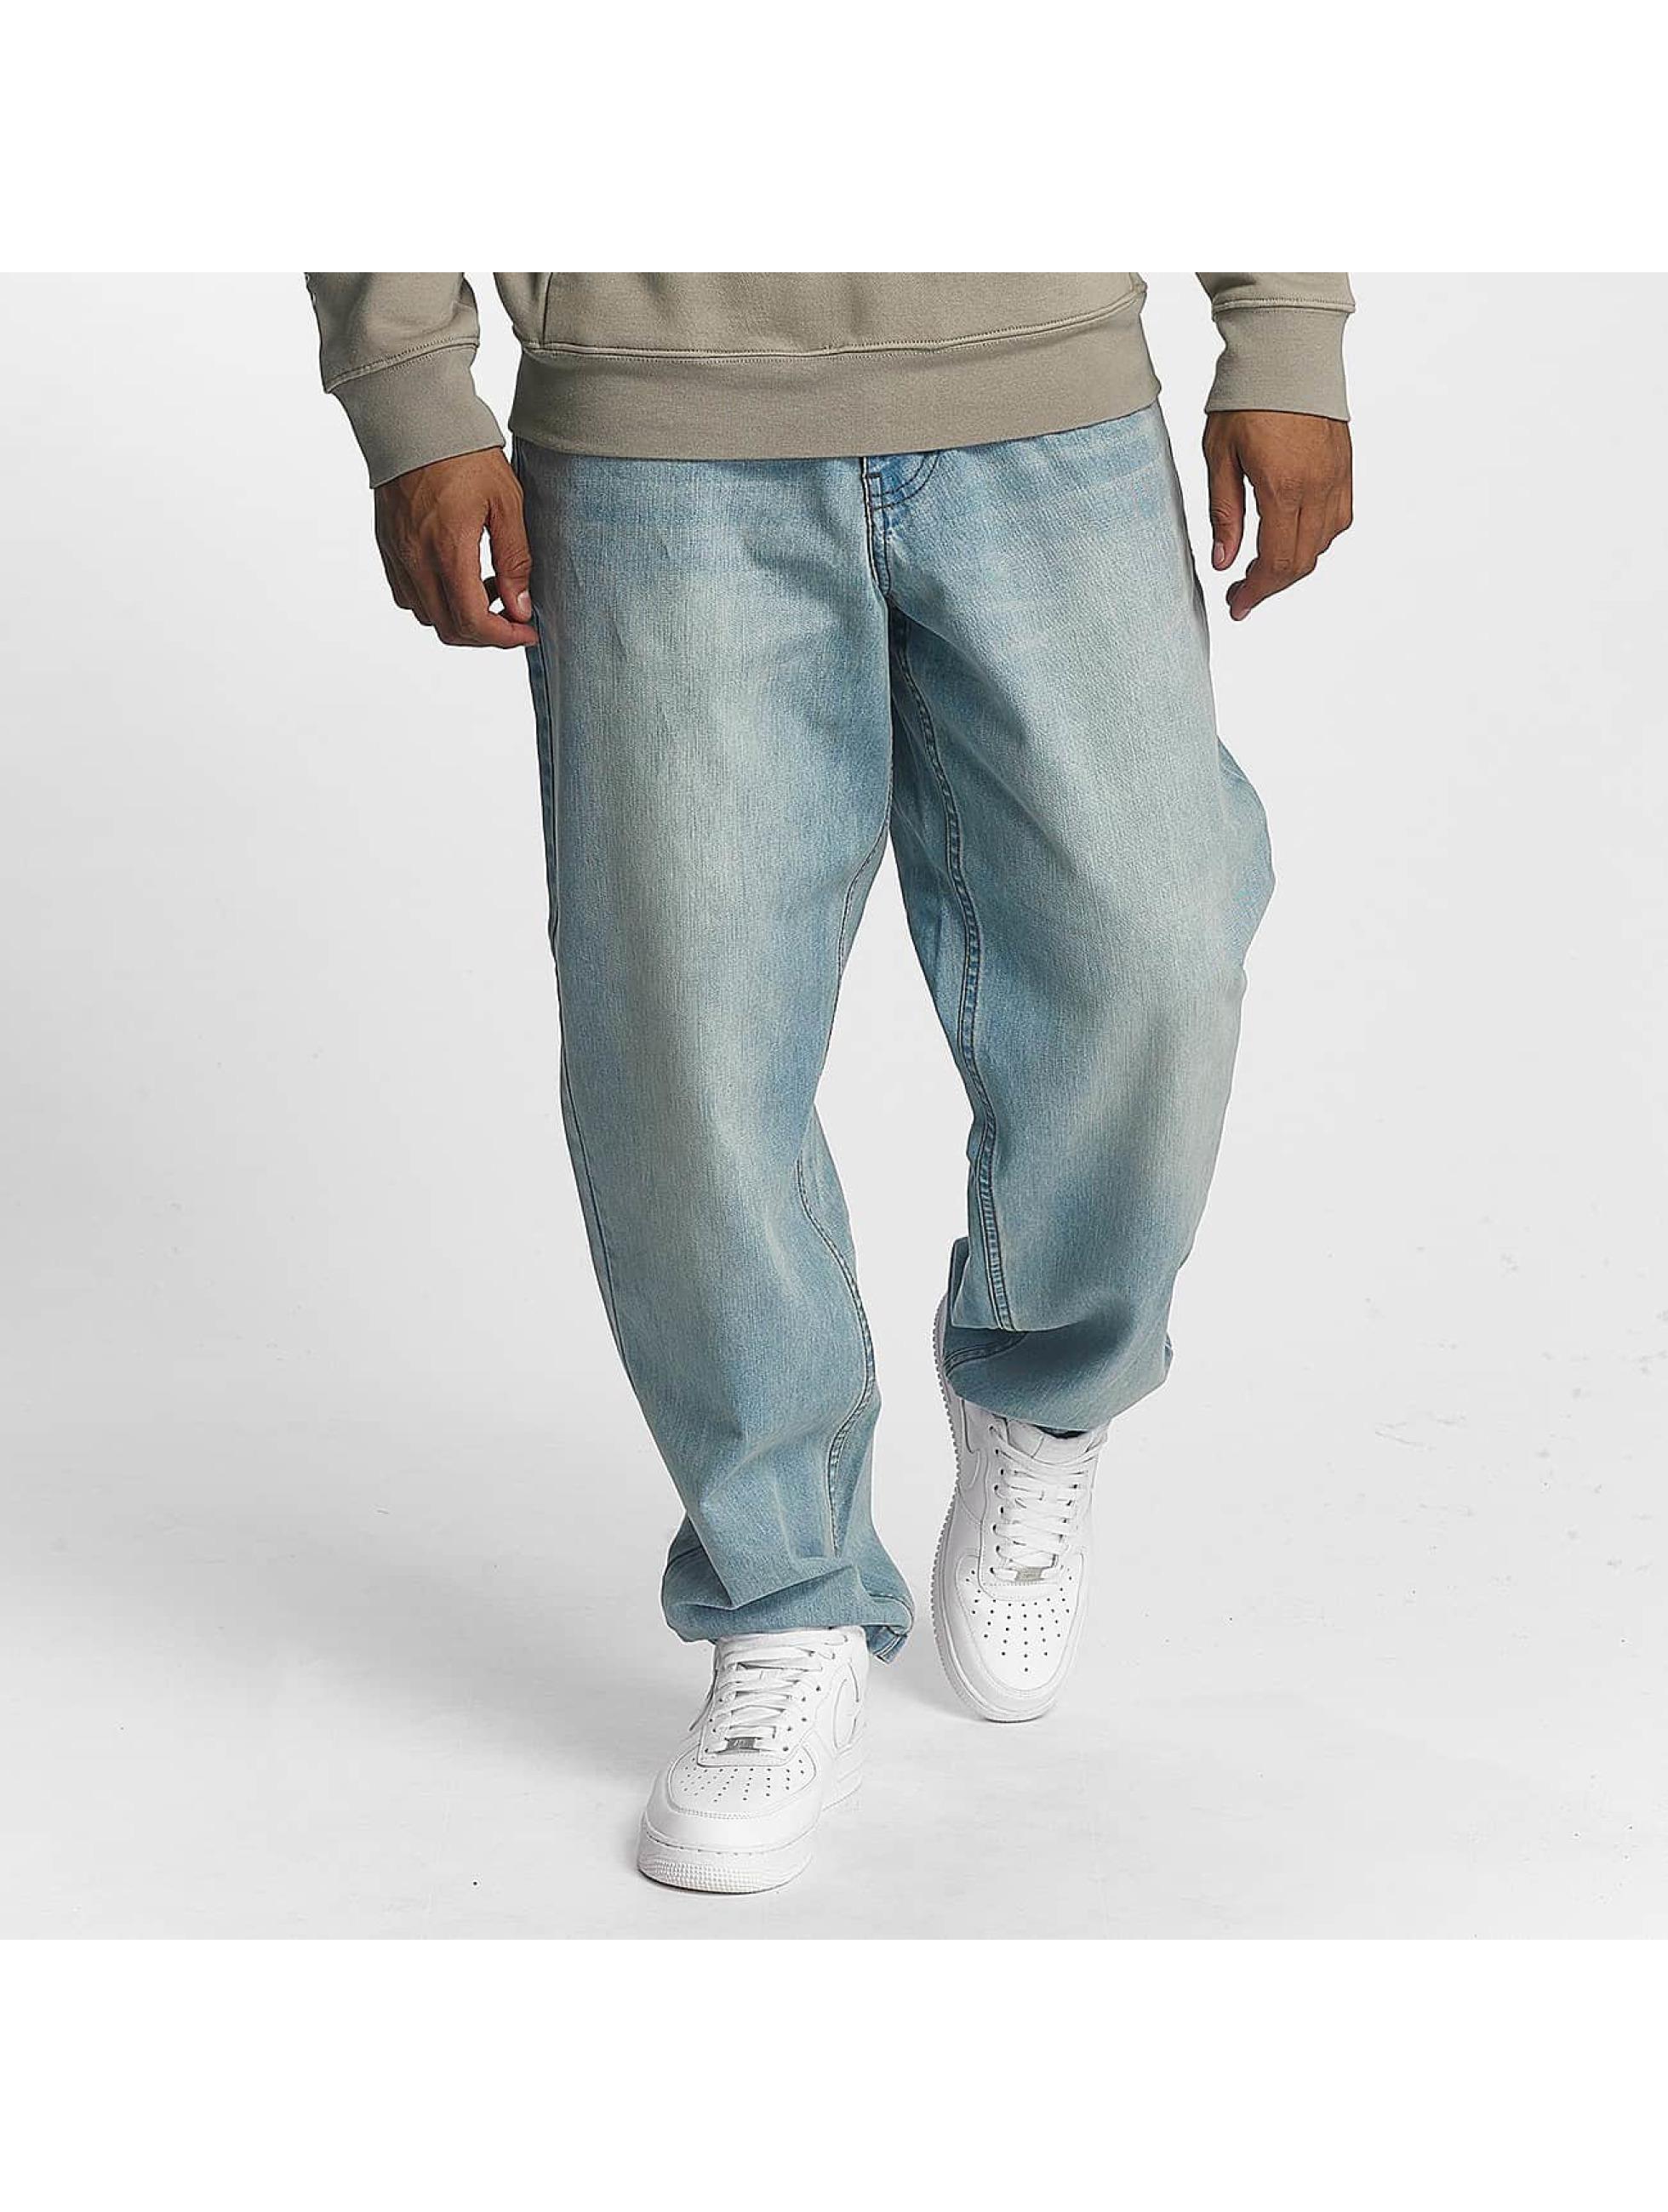 Rocawear / Loose Fit Jeans Lighter in blue W 42